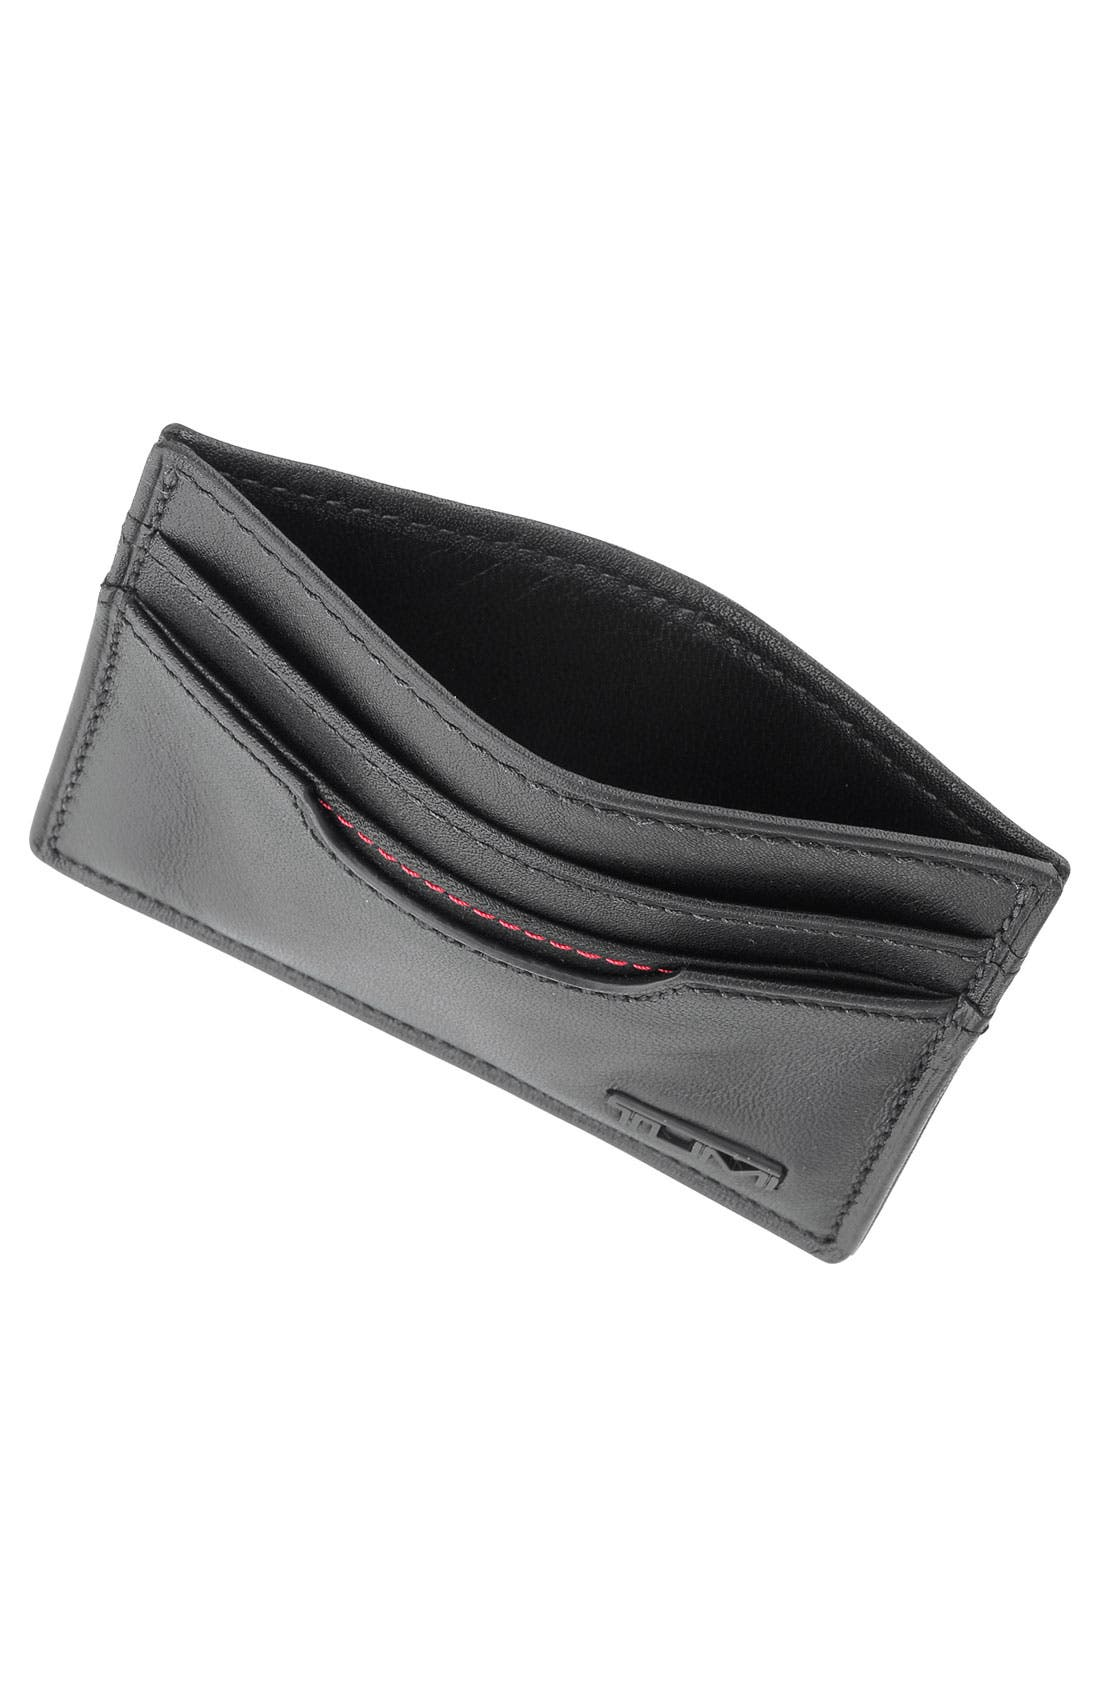 Alternate Image 2  - Tumi 'Delta' Slim Card Case ID Wallet